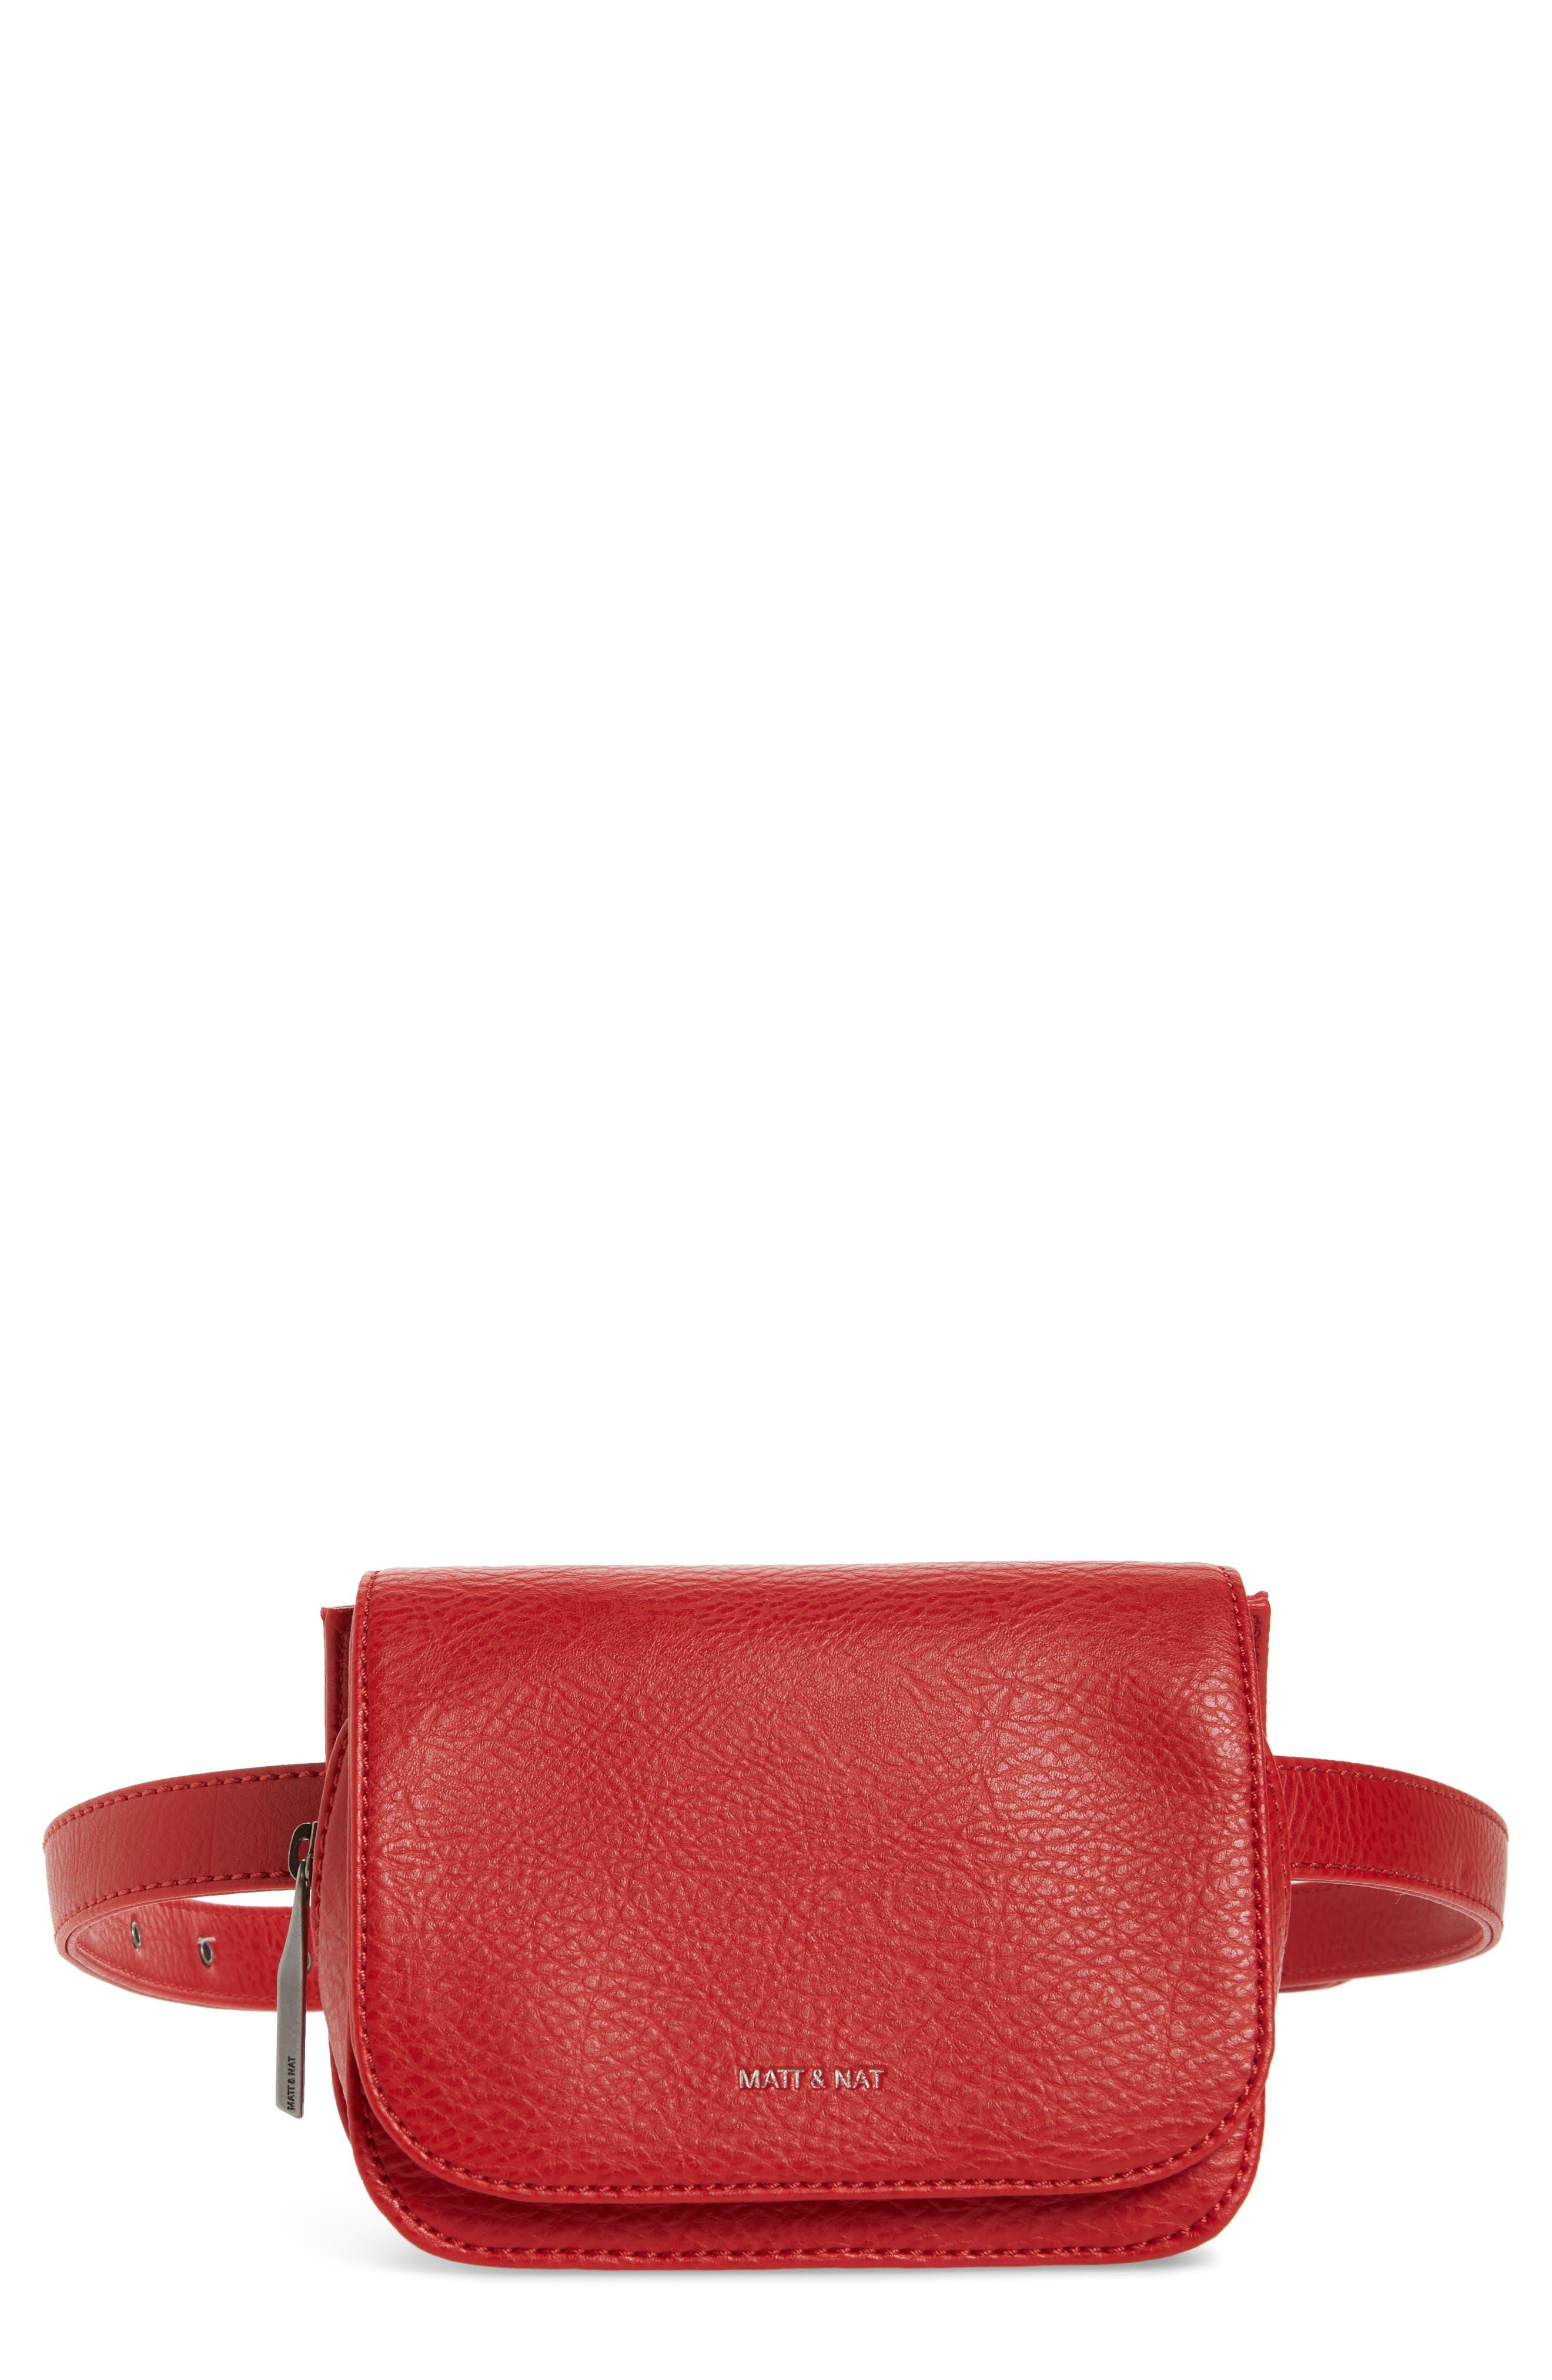 Matt & Nat Park Faux Leather Belt Bag - Red